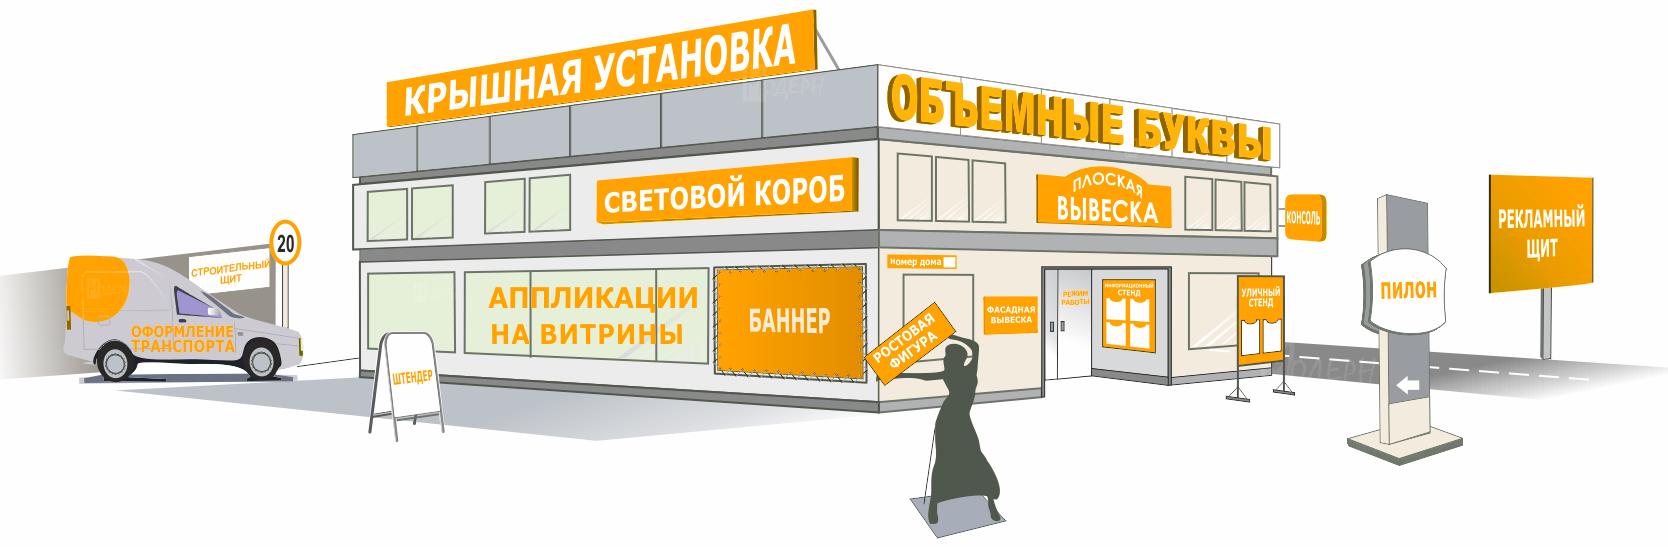 vidy-naruzhnaya-reklama.png